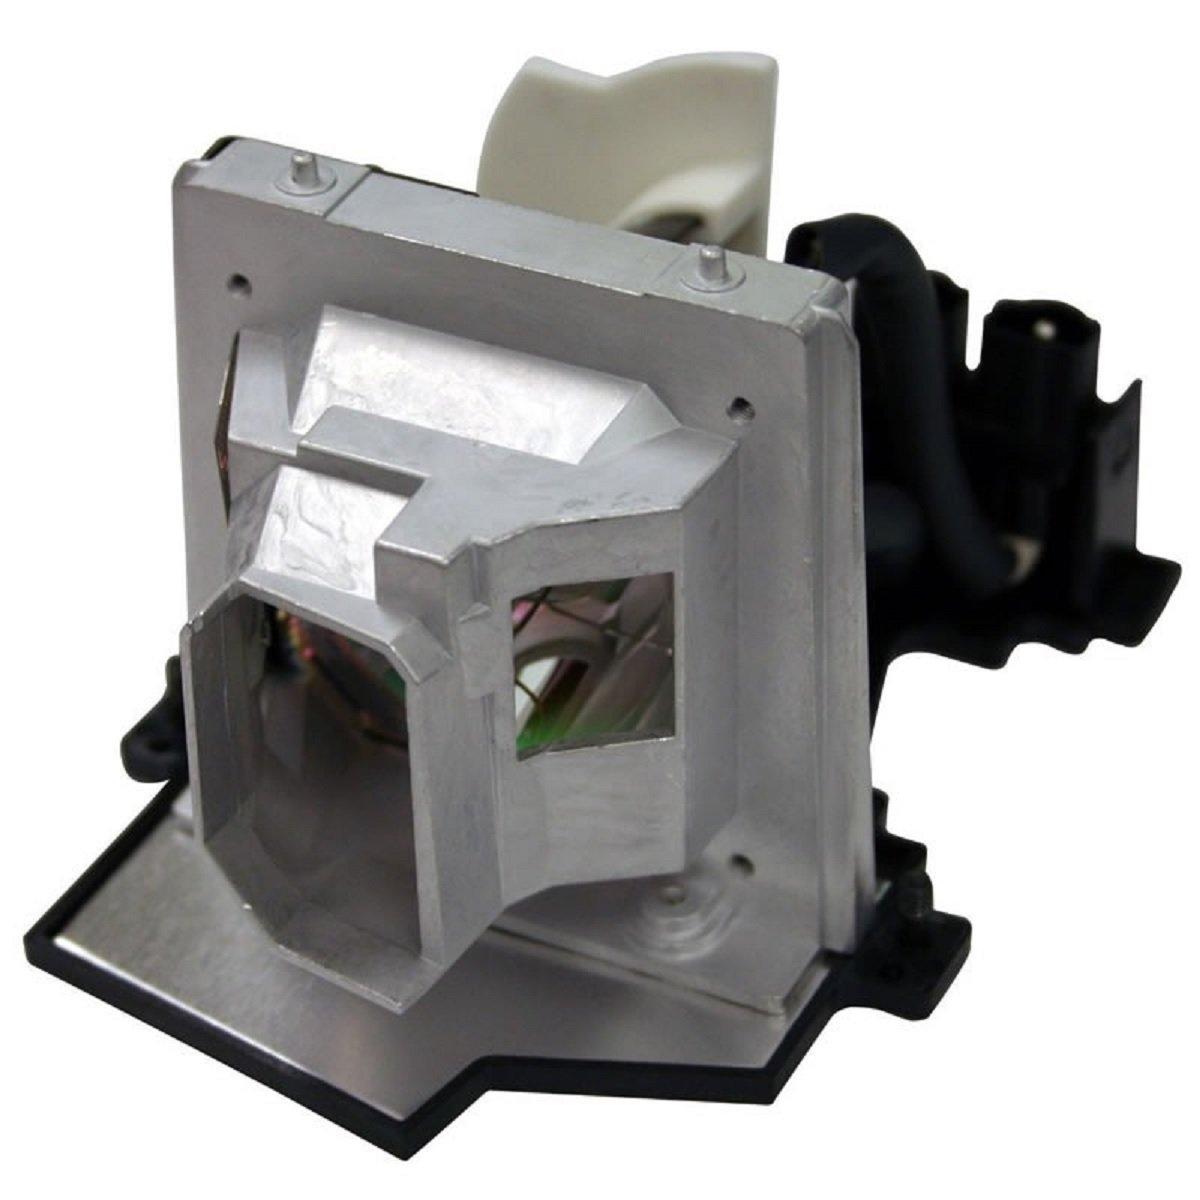 Amazing Lamps BL-FP230B / BL-FP230C / SP.85R01GC01 純正電球 Optoma プロジェクター用互換ハウジング付き   B07838DBWH